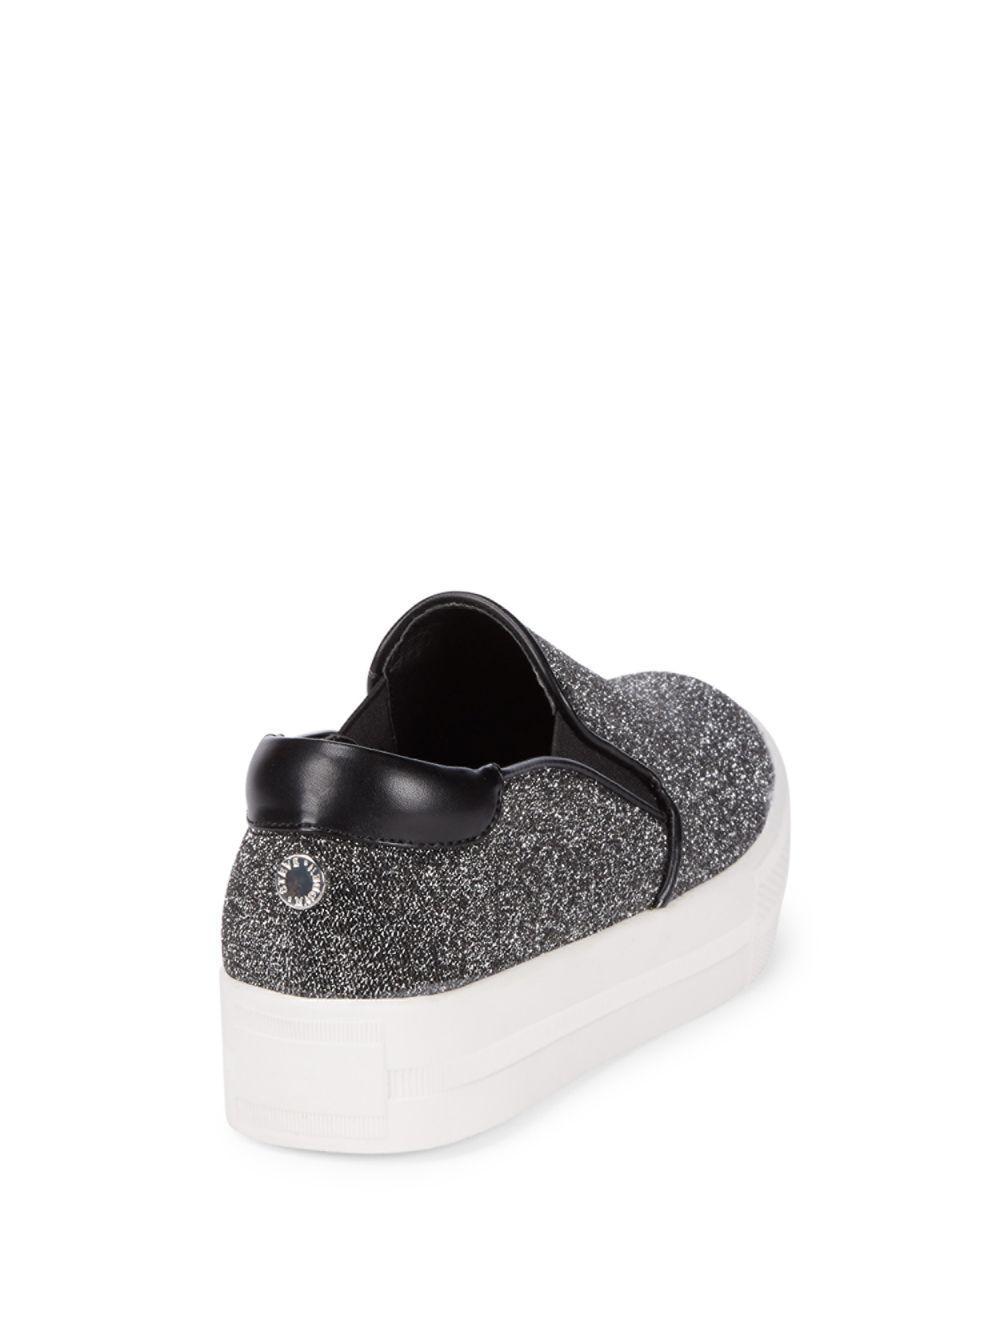 c91cd9ba04b Lyst - Steve Madden Glimmy Slip On Sneakers - Save 23%